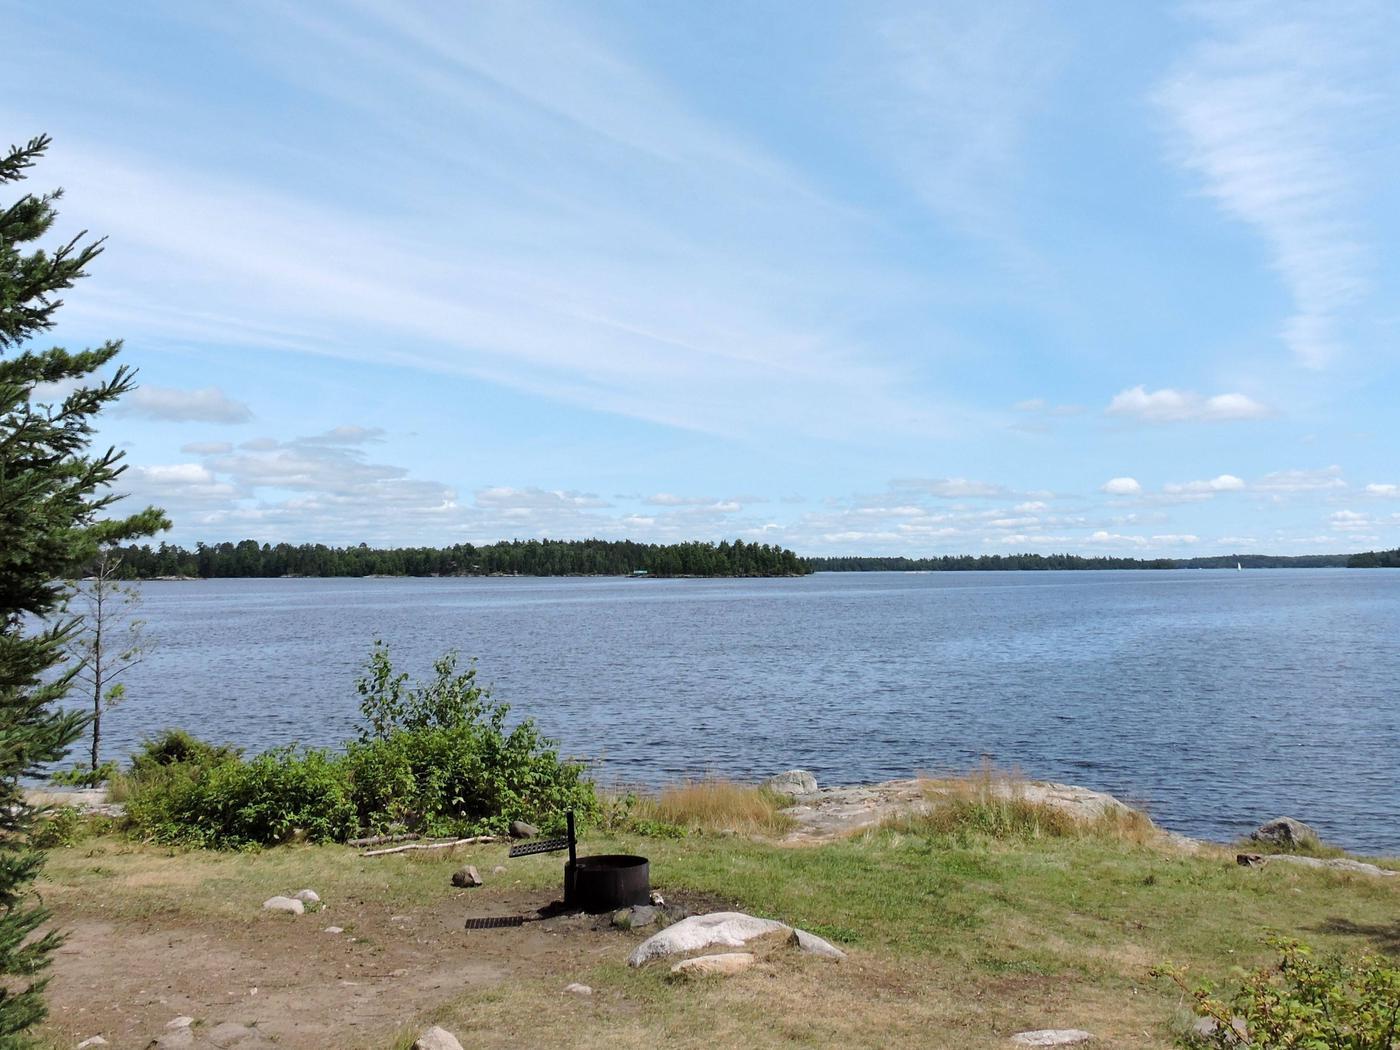 N55 - Namakan Island NortheastN55 - Namakan Island Northeast campsite on Namakan Lake